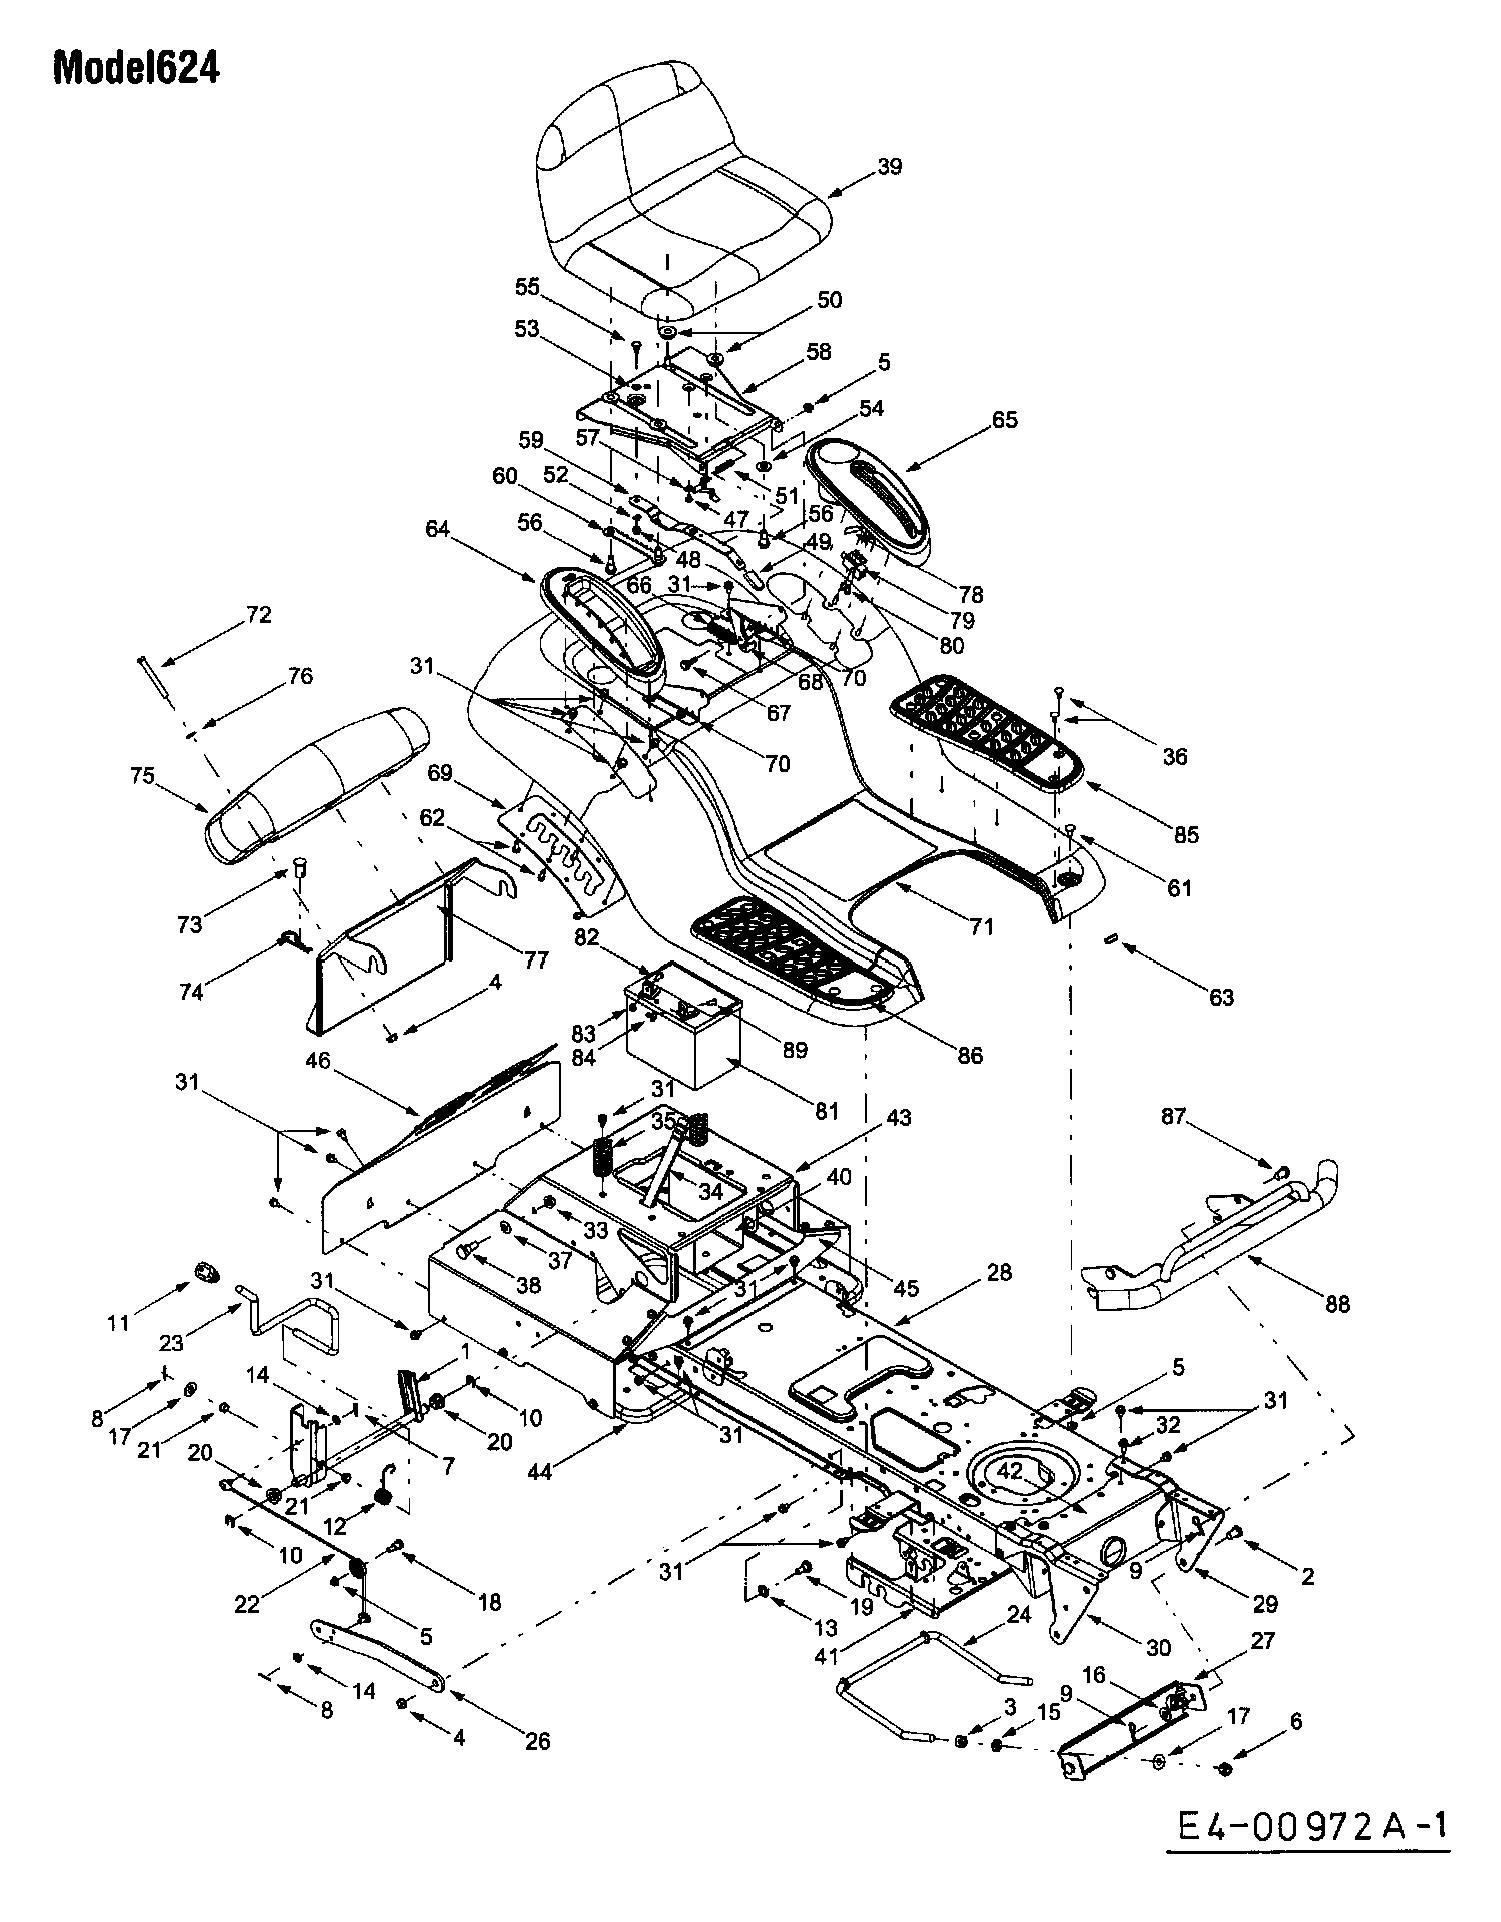 medium resolution of nissan 280zx wiring diagram imageresizertool com datsun 280zx engine diagram 240sx wiring diagram